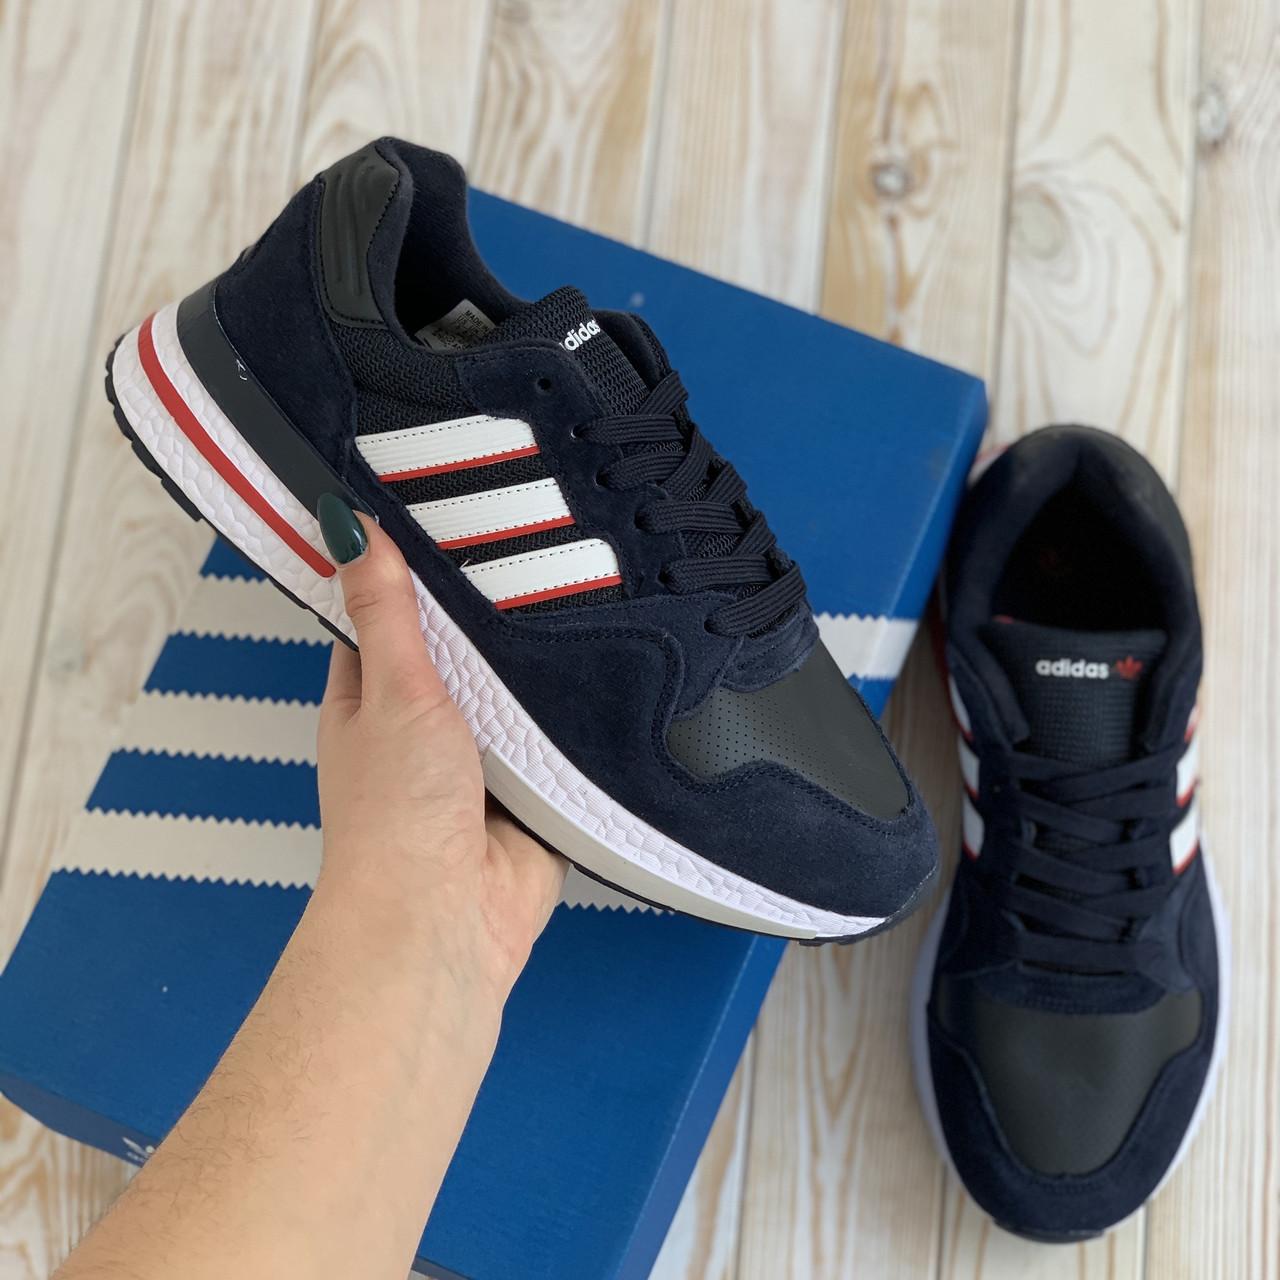 ZX 500 сині кросівки чоловічі кросівки, кеди